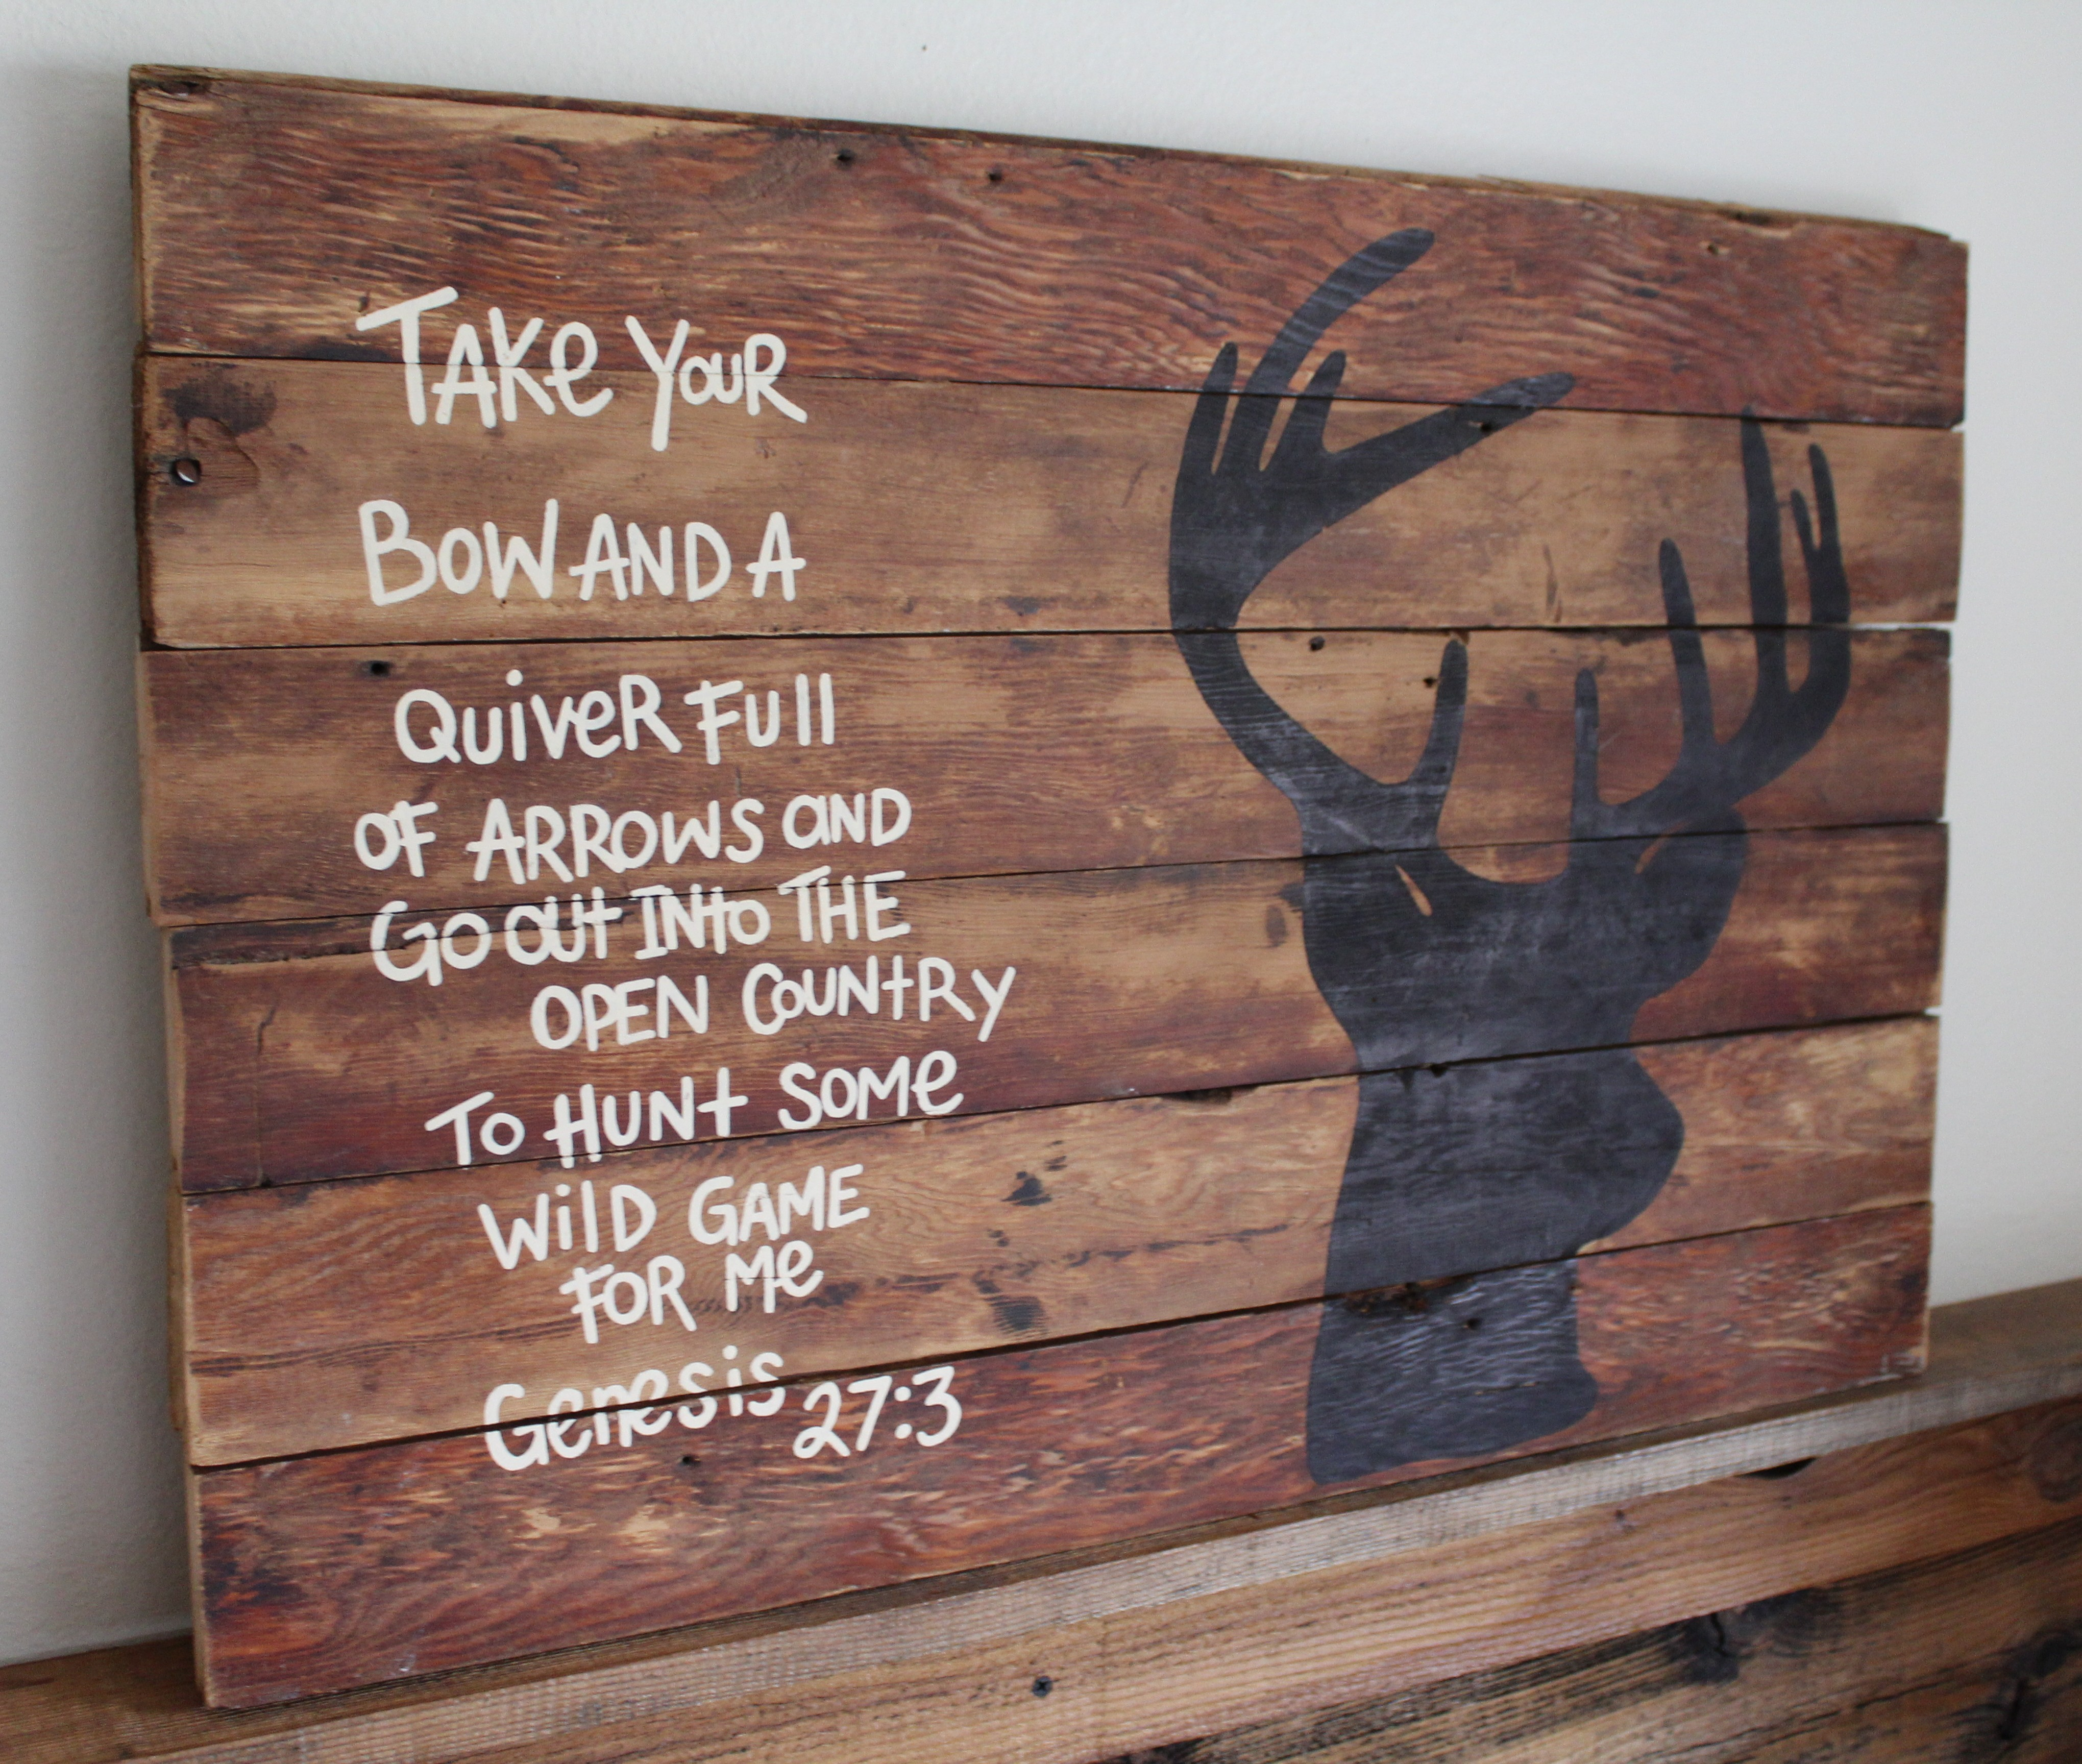 Antler Cross Genesis 27:3 Religous Hunting Decal